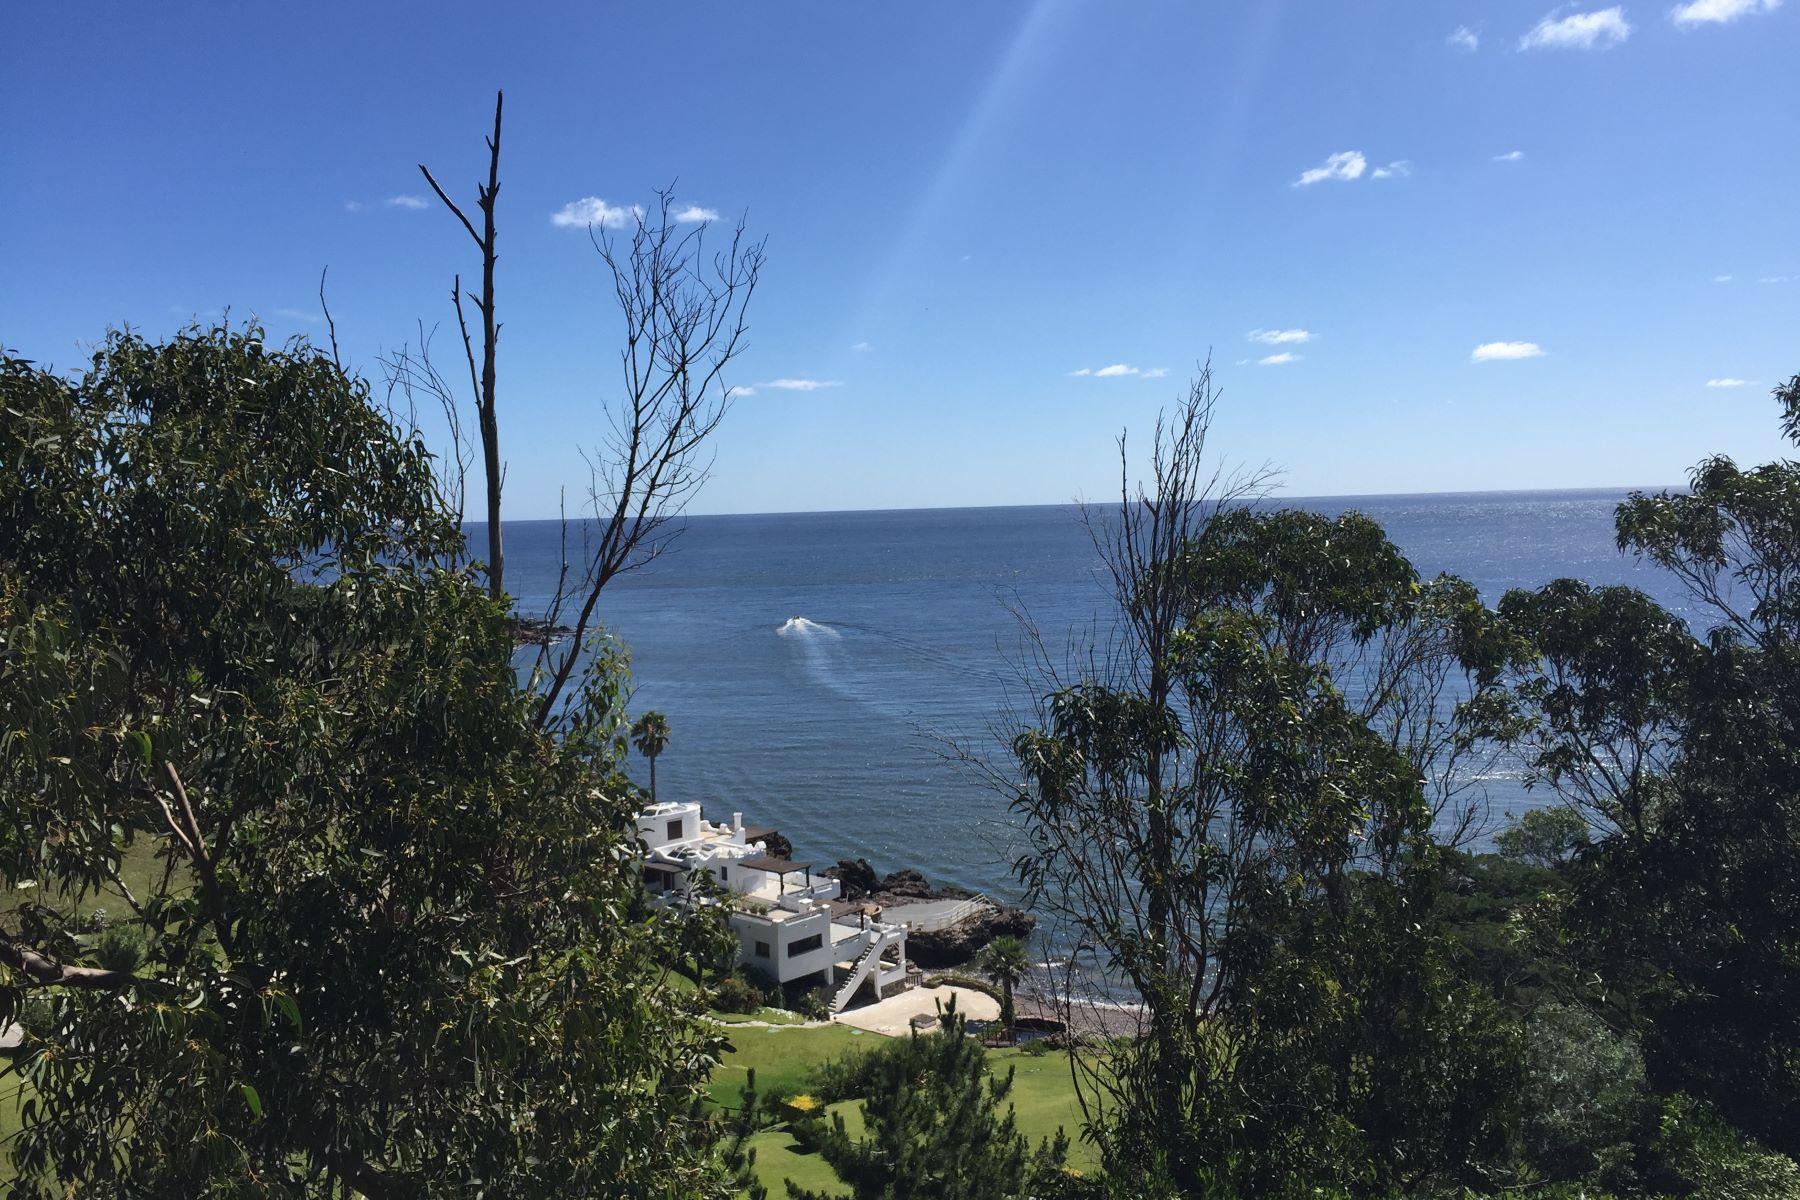 Moradia para Venda às Terrazas de la Ballena Punta Del Este, Maldonado, Uruguai